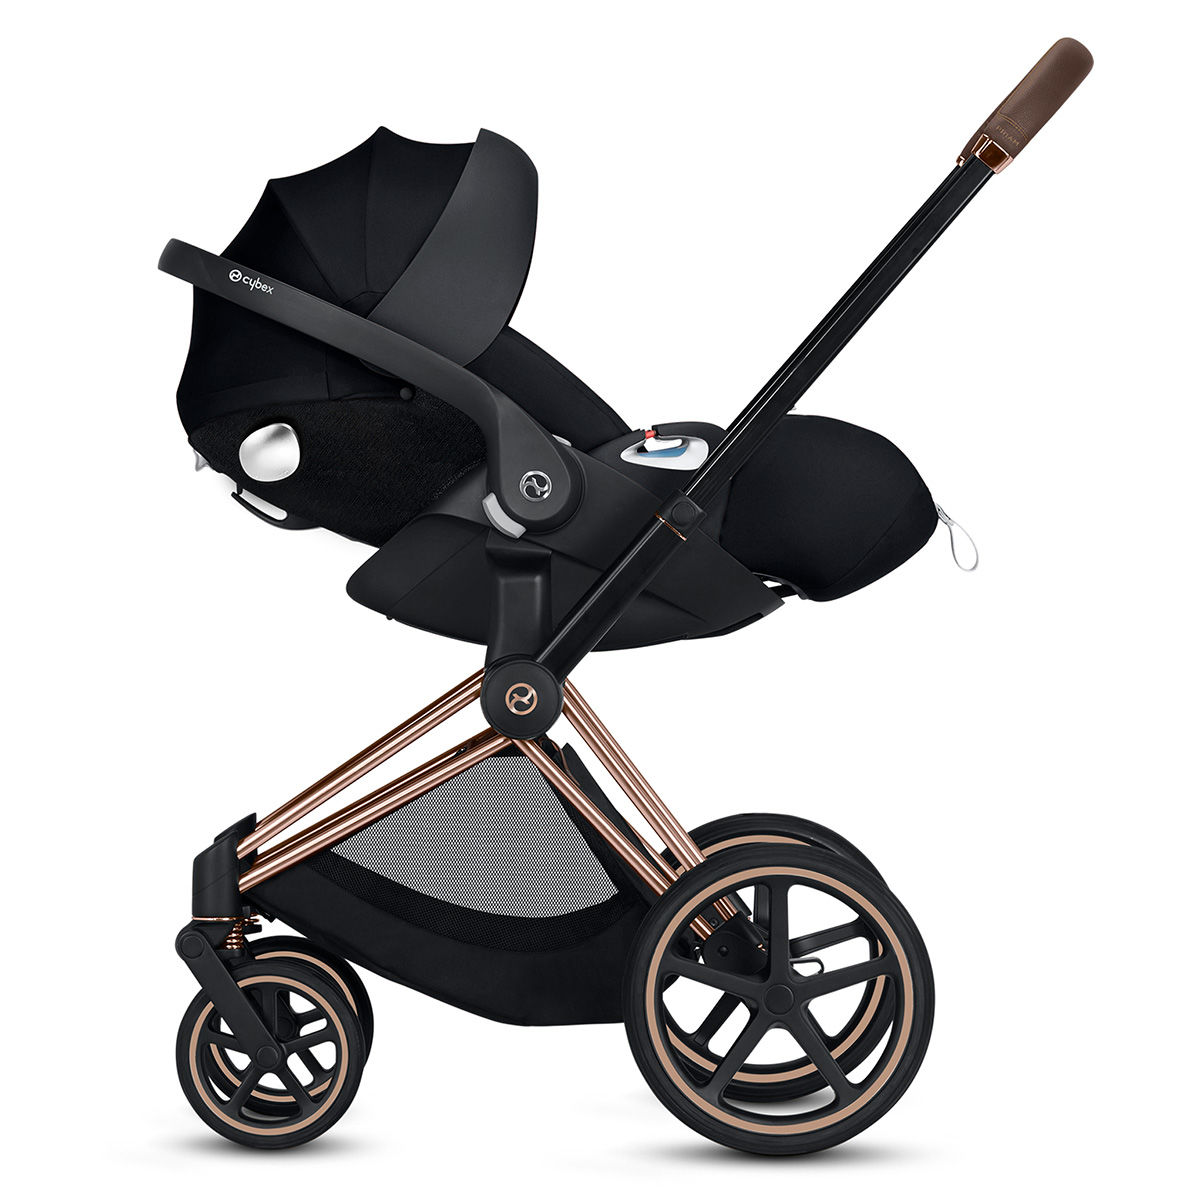 Cybex PRIAM Stroller Chrome & Black-Premium Black | Your ...